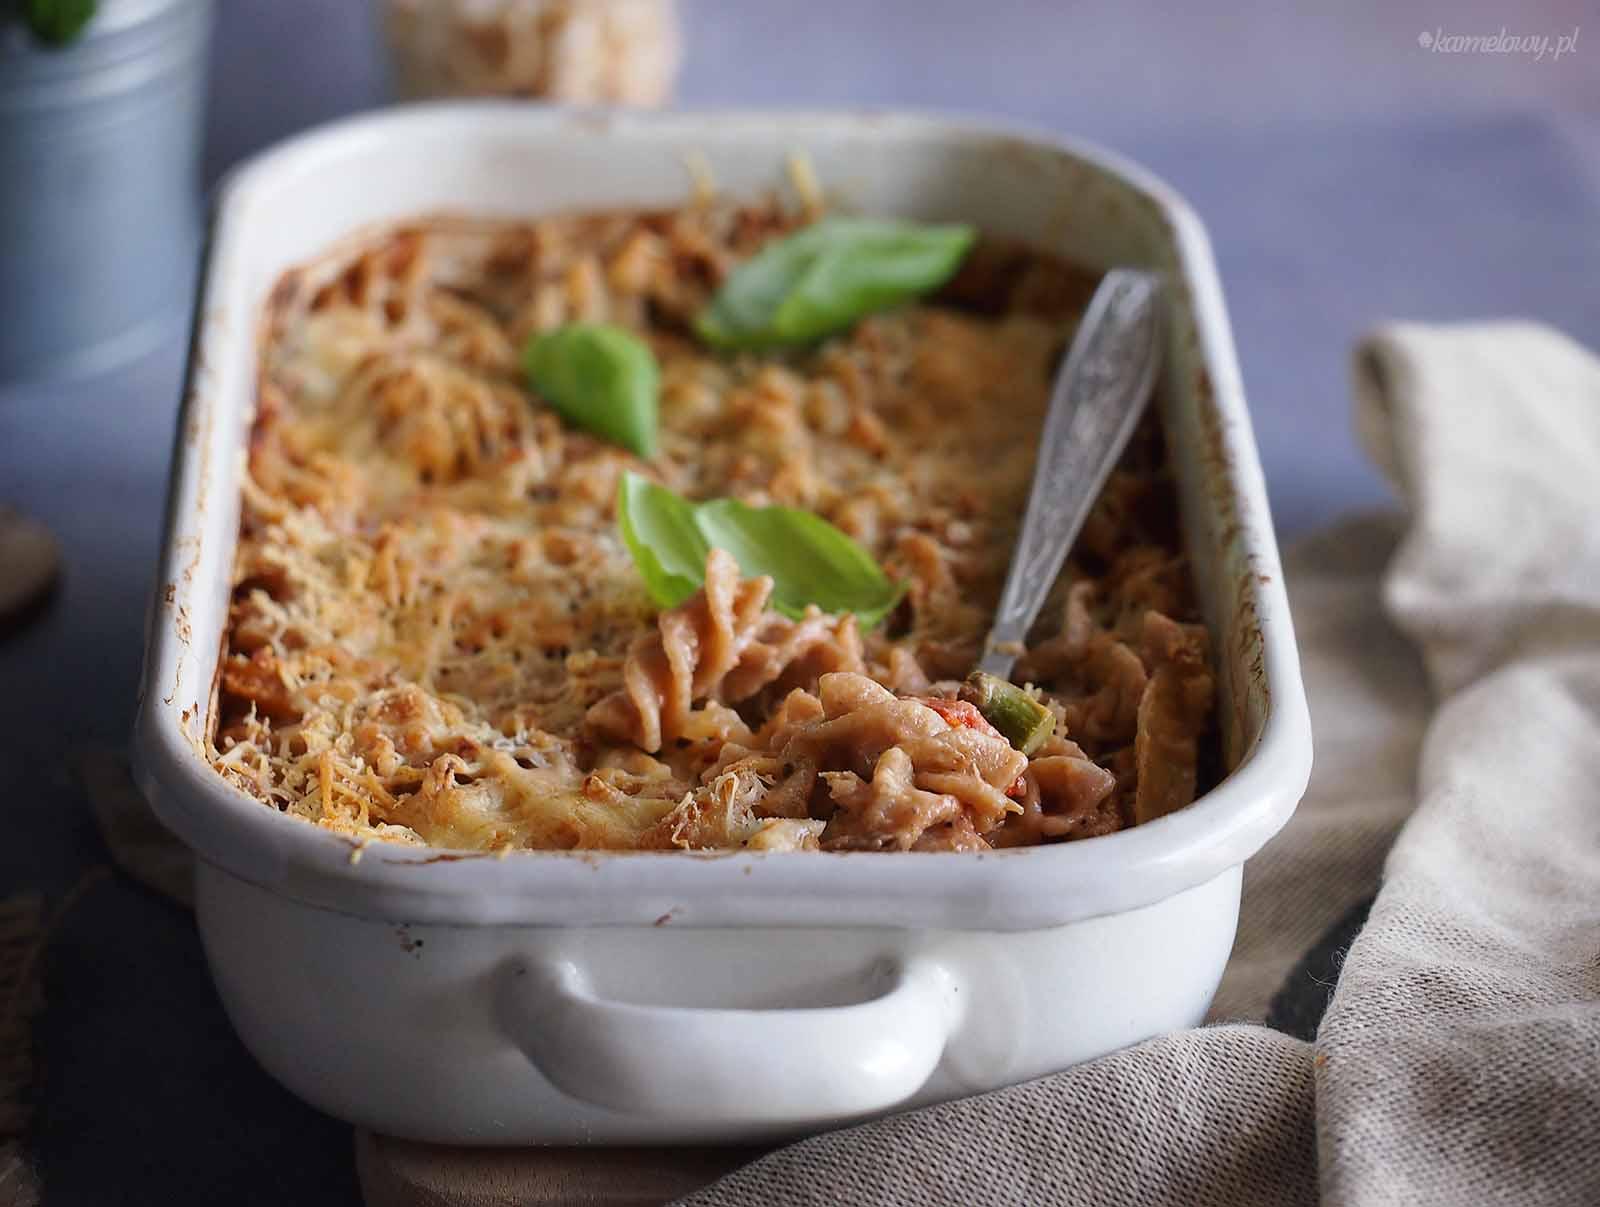 Zapiekanka-makaronowa-z-miesem-i-szparagami-Meat-and-asparagus-pasta-bake